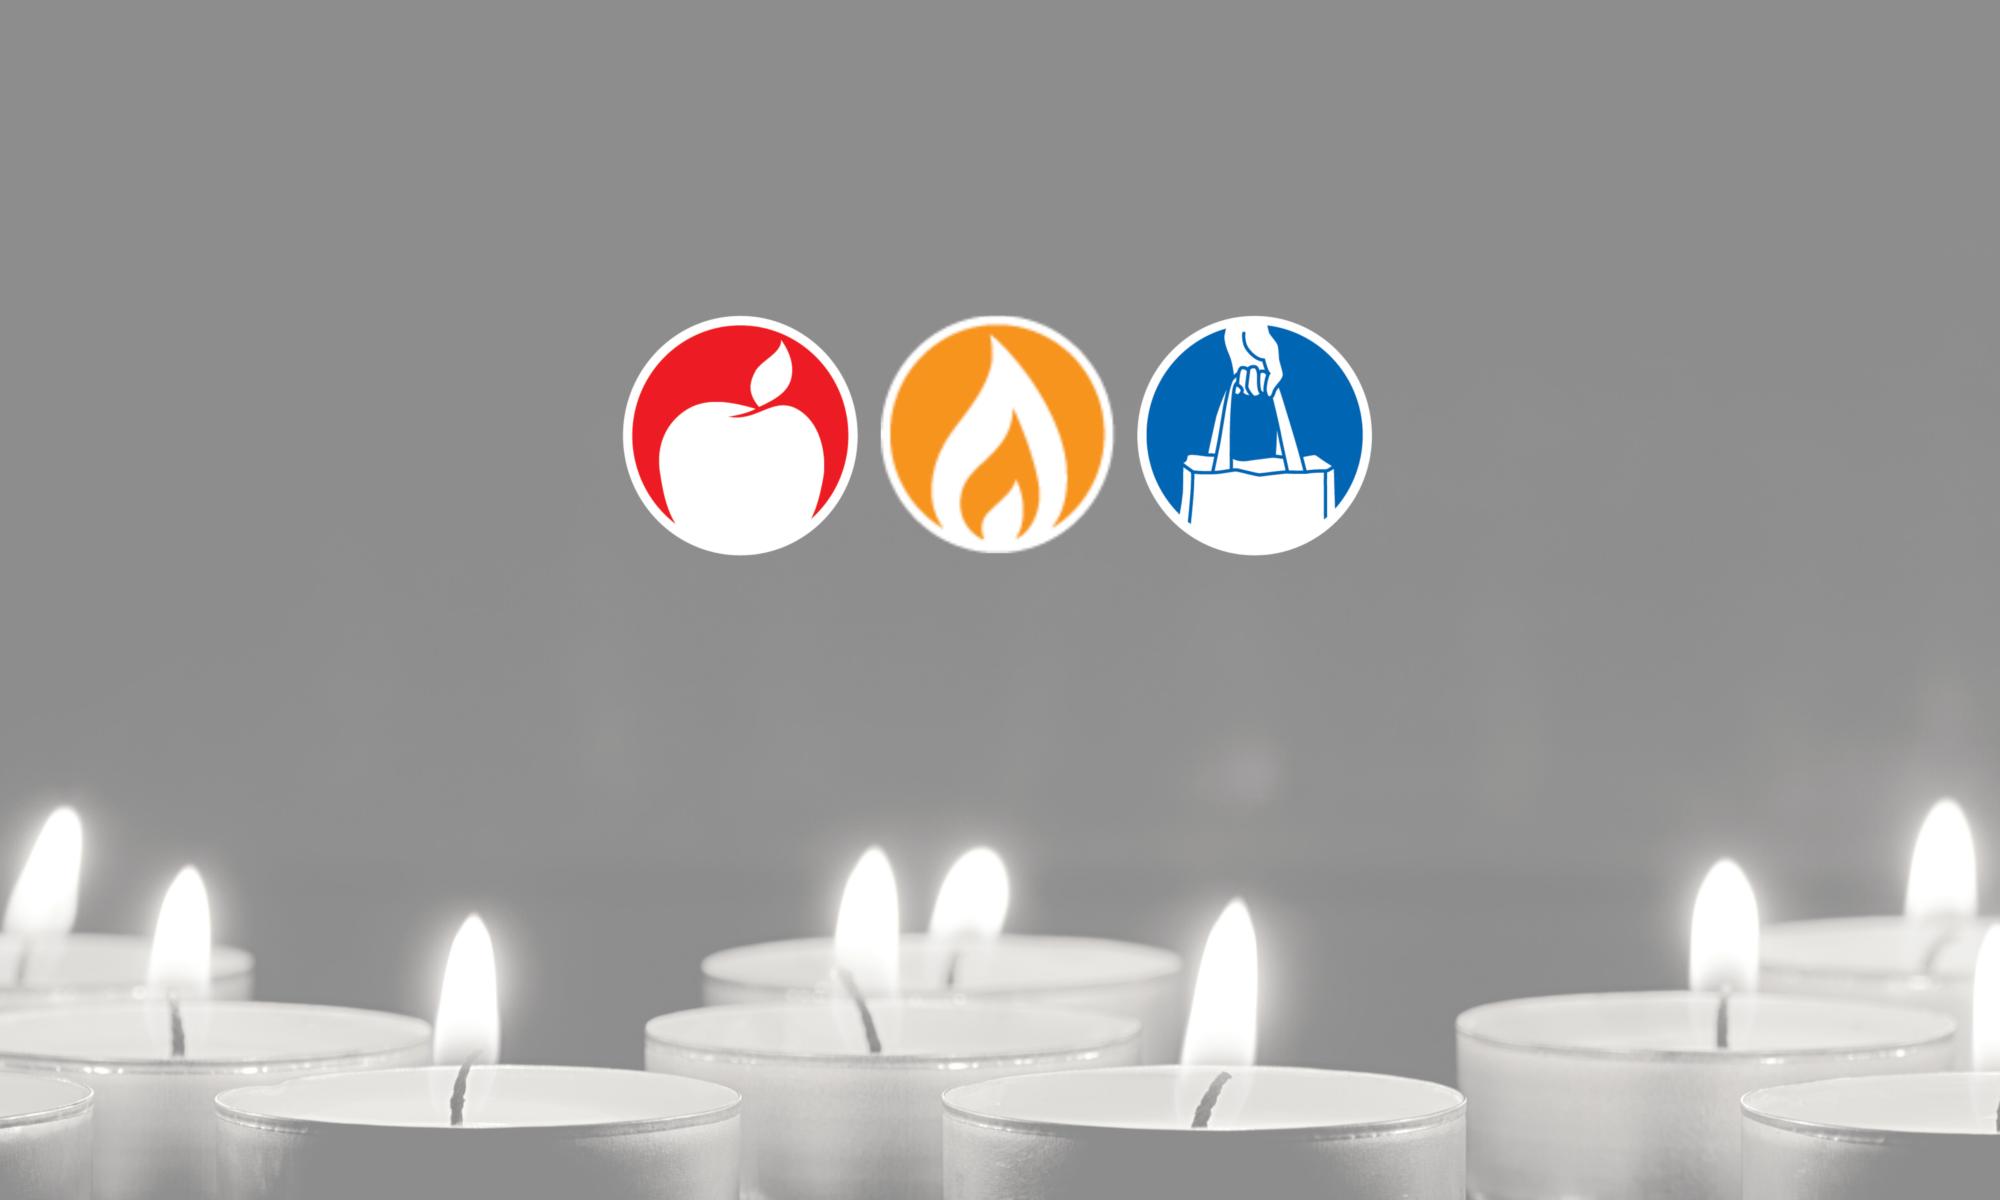 Attleboro Area Interfaith Collaborative